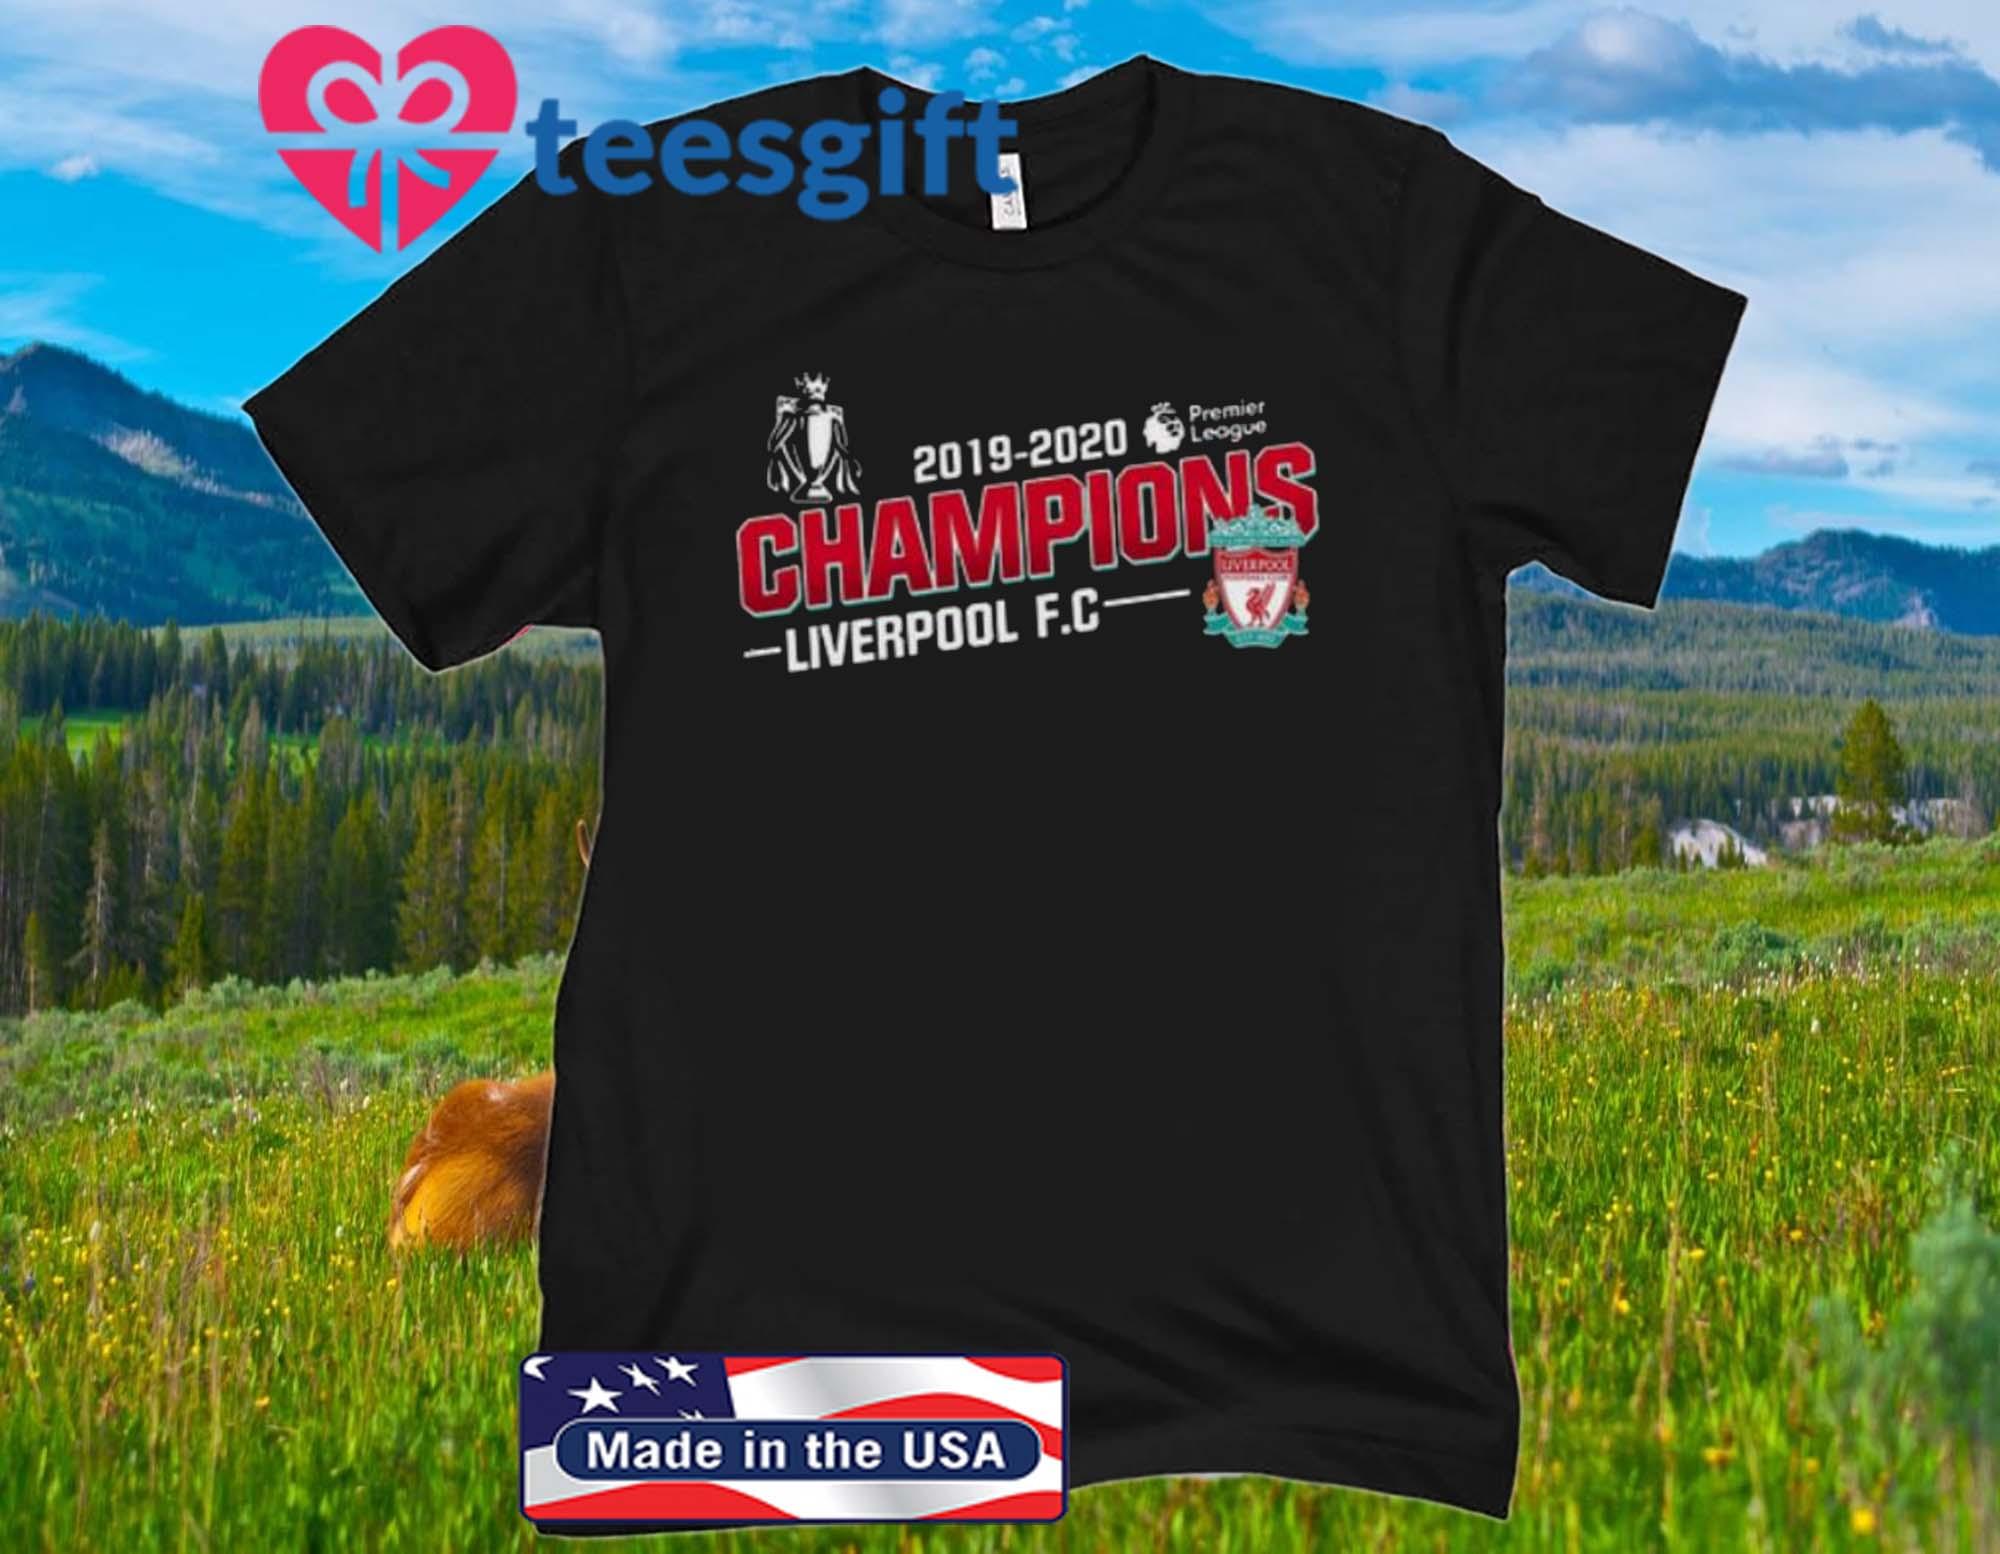 Champions Liverpool FC 2019-2020 Premier League Tshirt